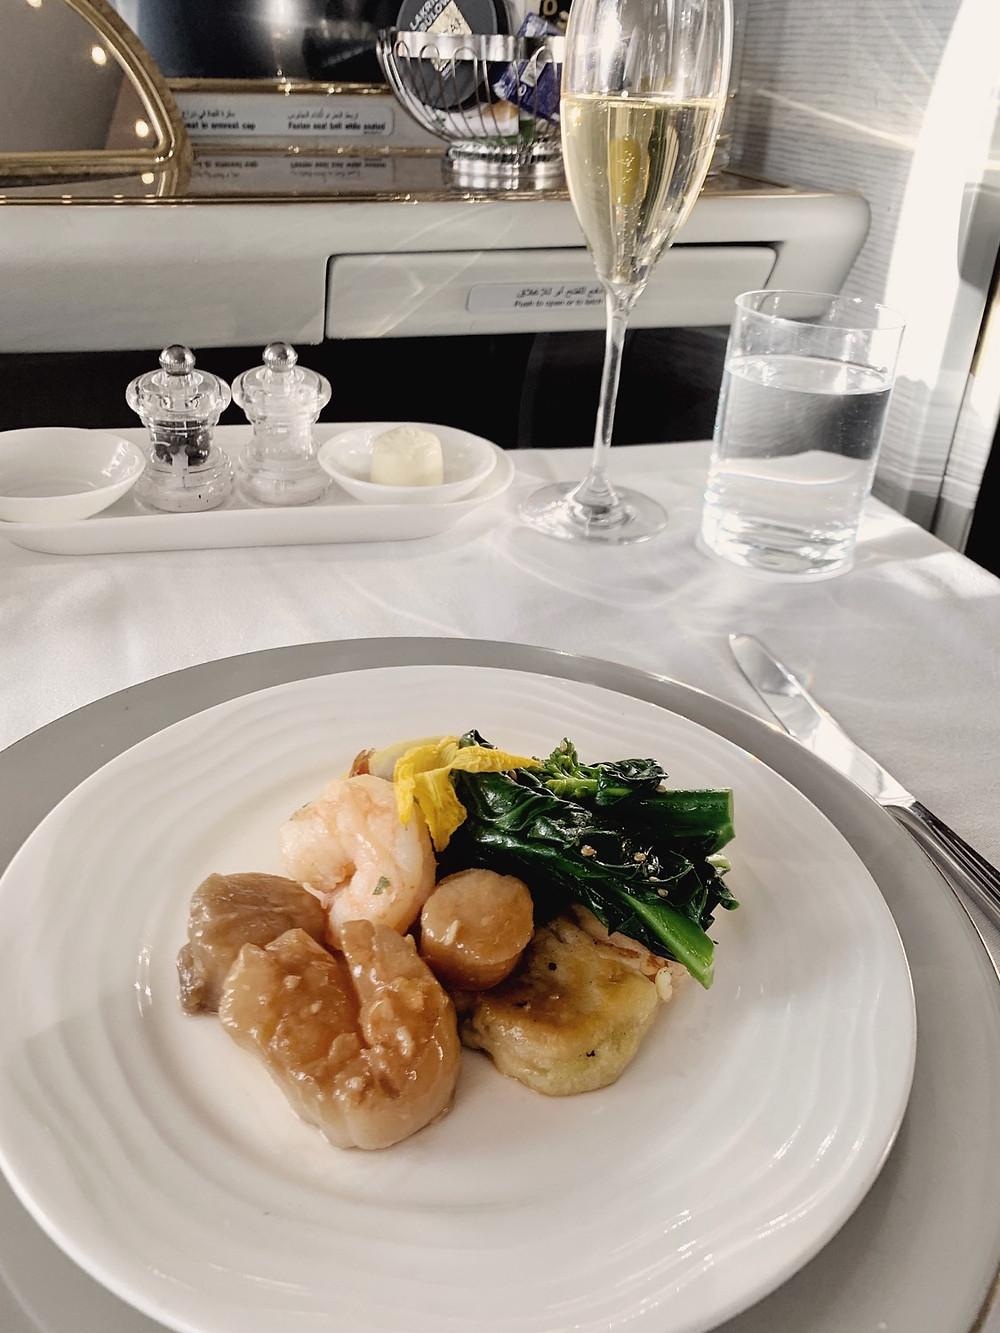 Emirates First Class San Francisco - Dubai, Scallop Appetizer